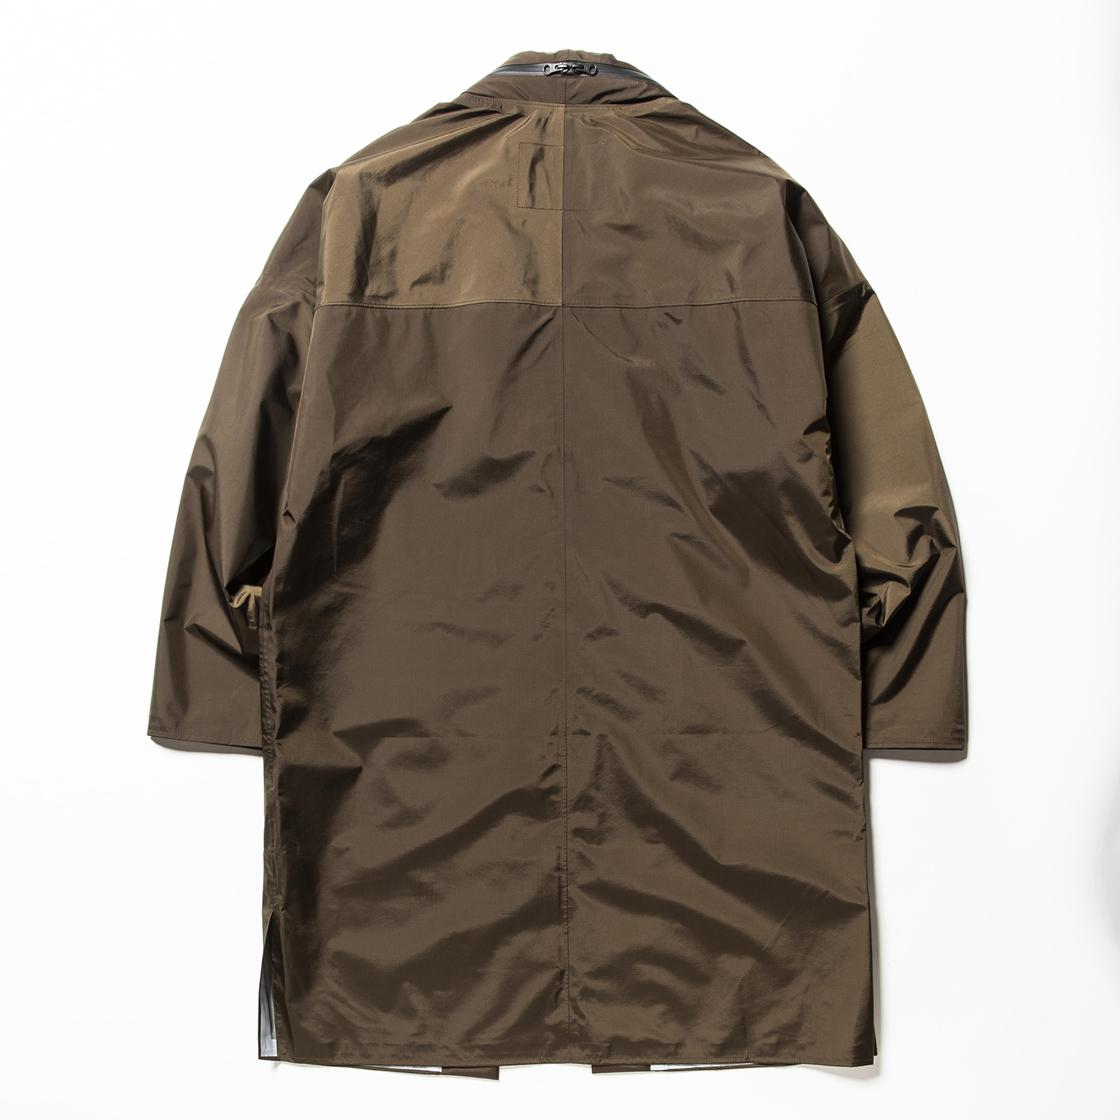 3 Layer Detachable Anorak Coat×FDMTL Khaki